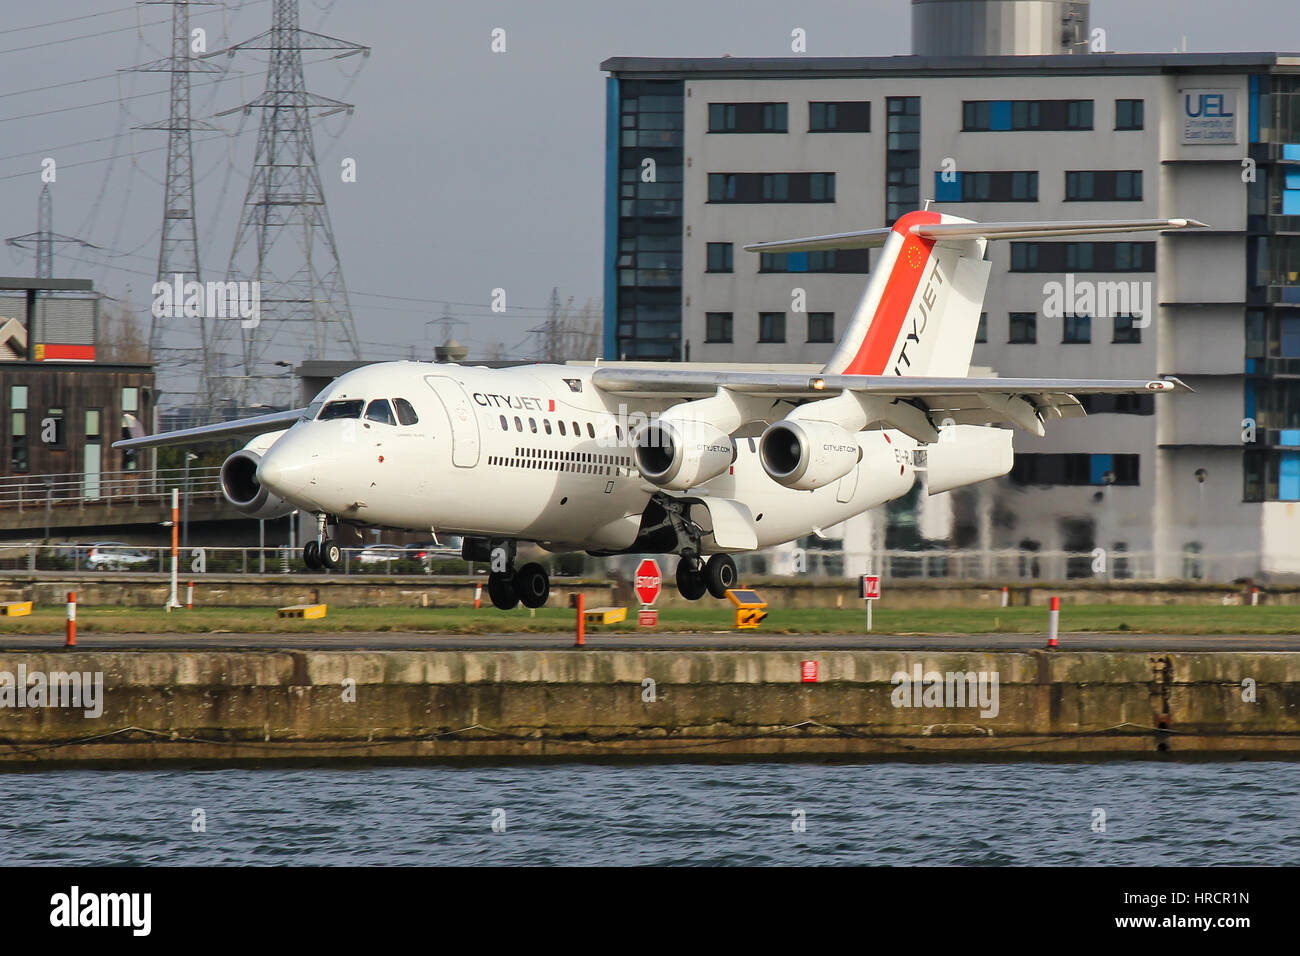 CityJet BAe-146 landing at London City Airport - Stock Image